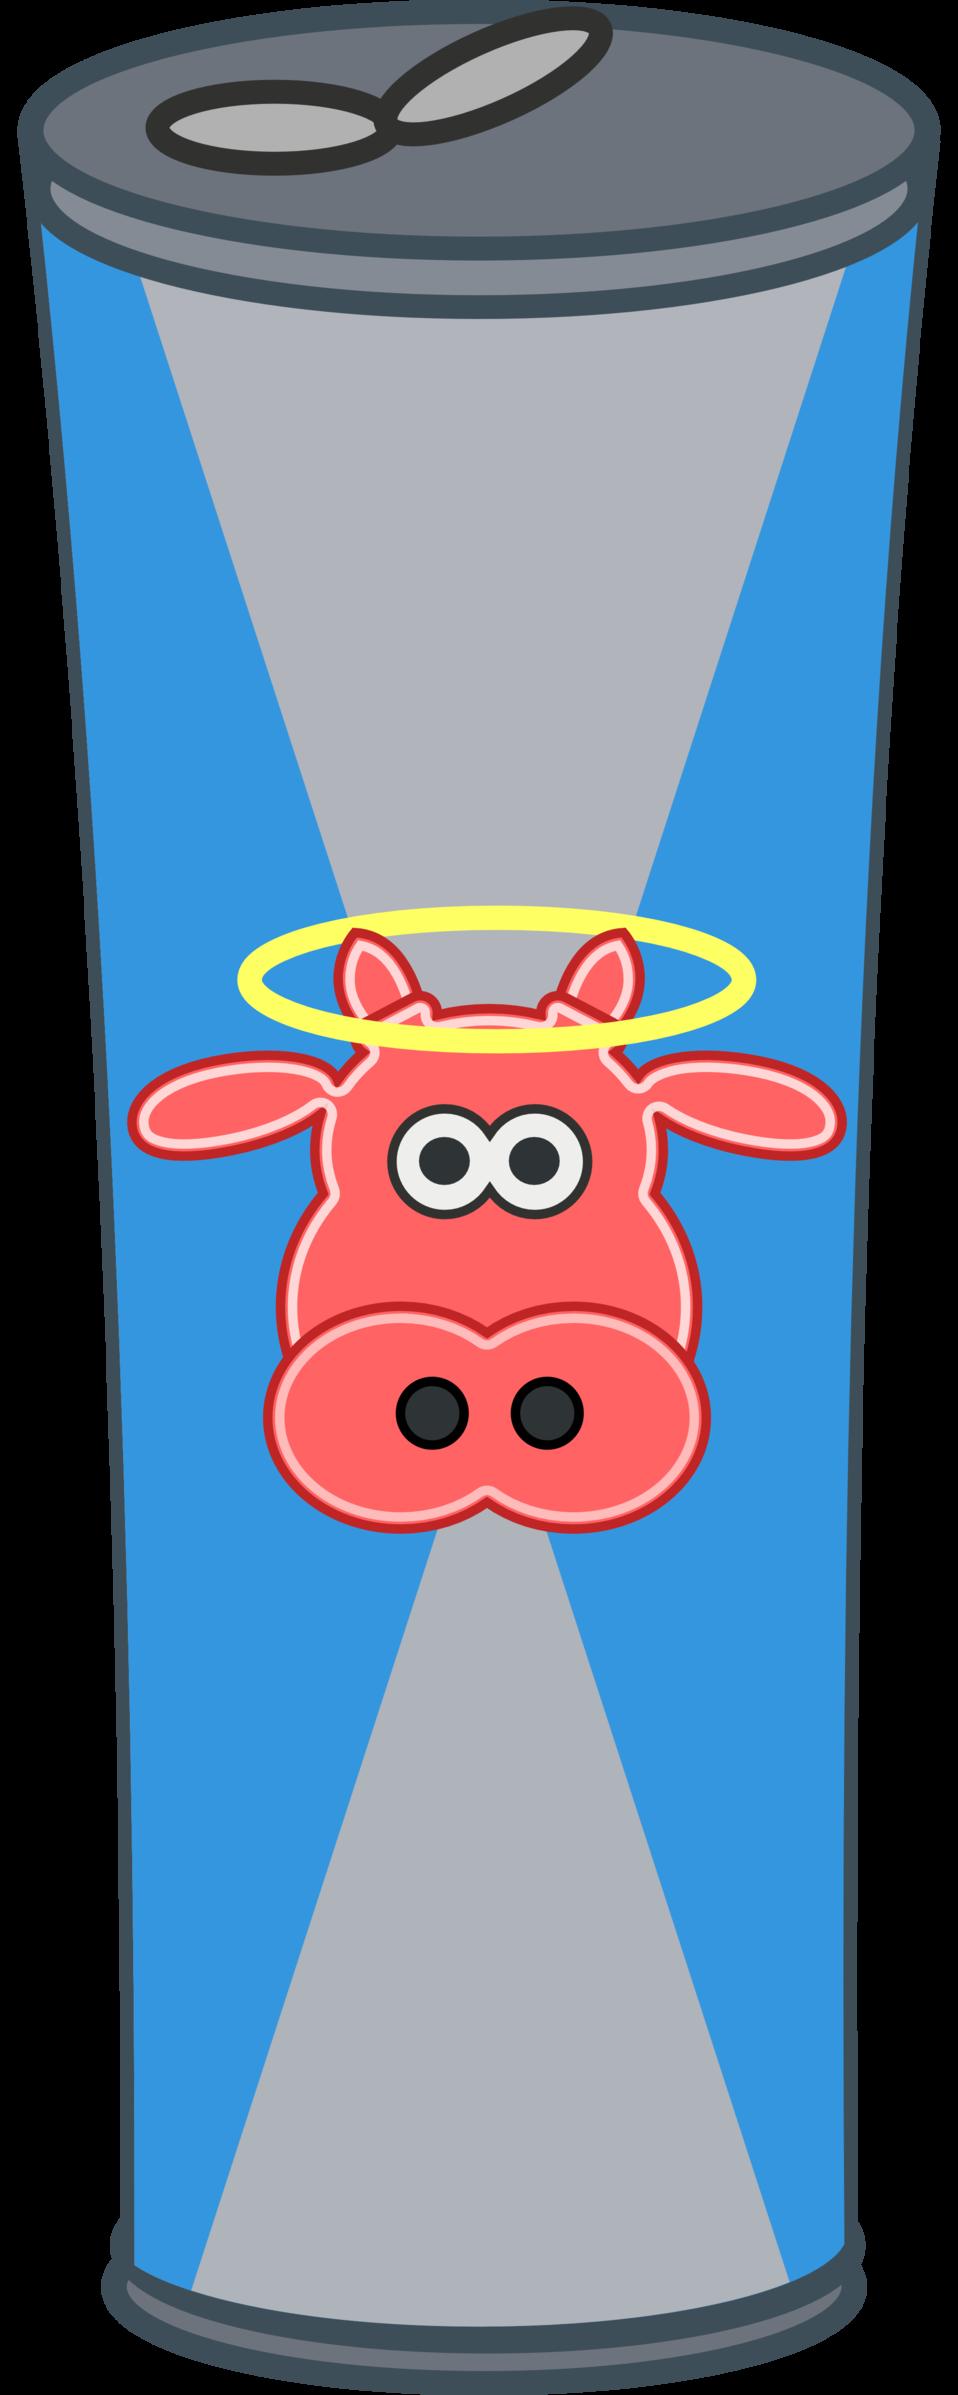 Simple Cartoon Energy Drink Can